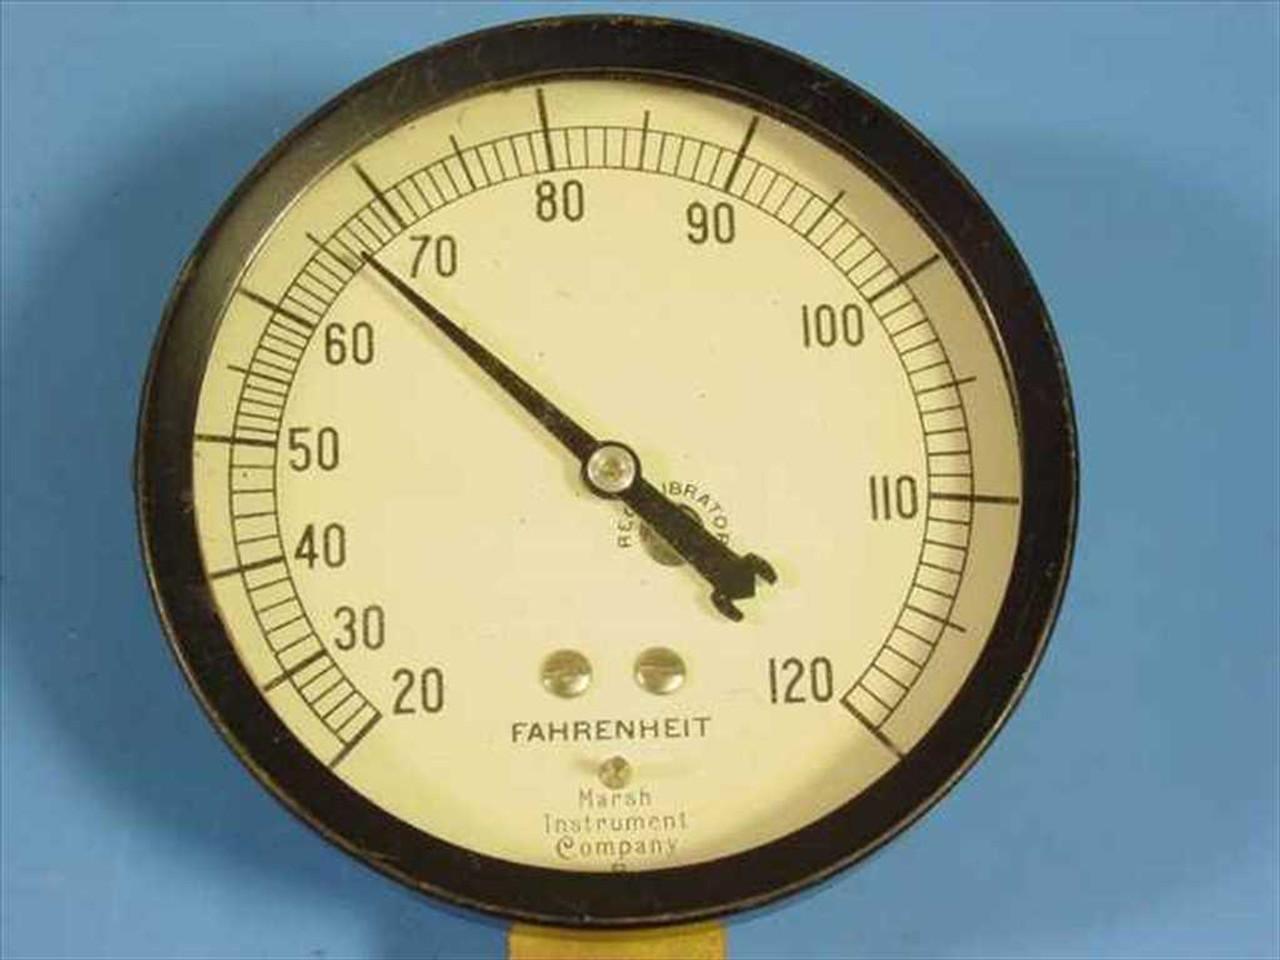 Marsh Instrument Company 120 Degree Fahrenheit Temperature Gauge